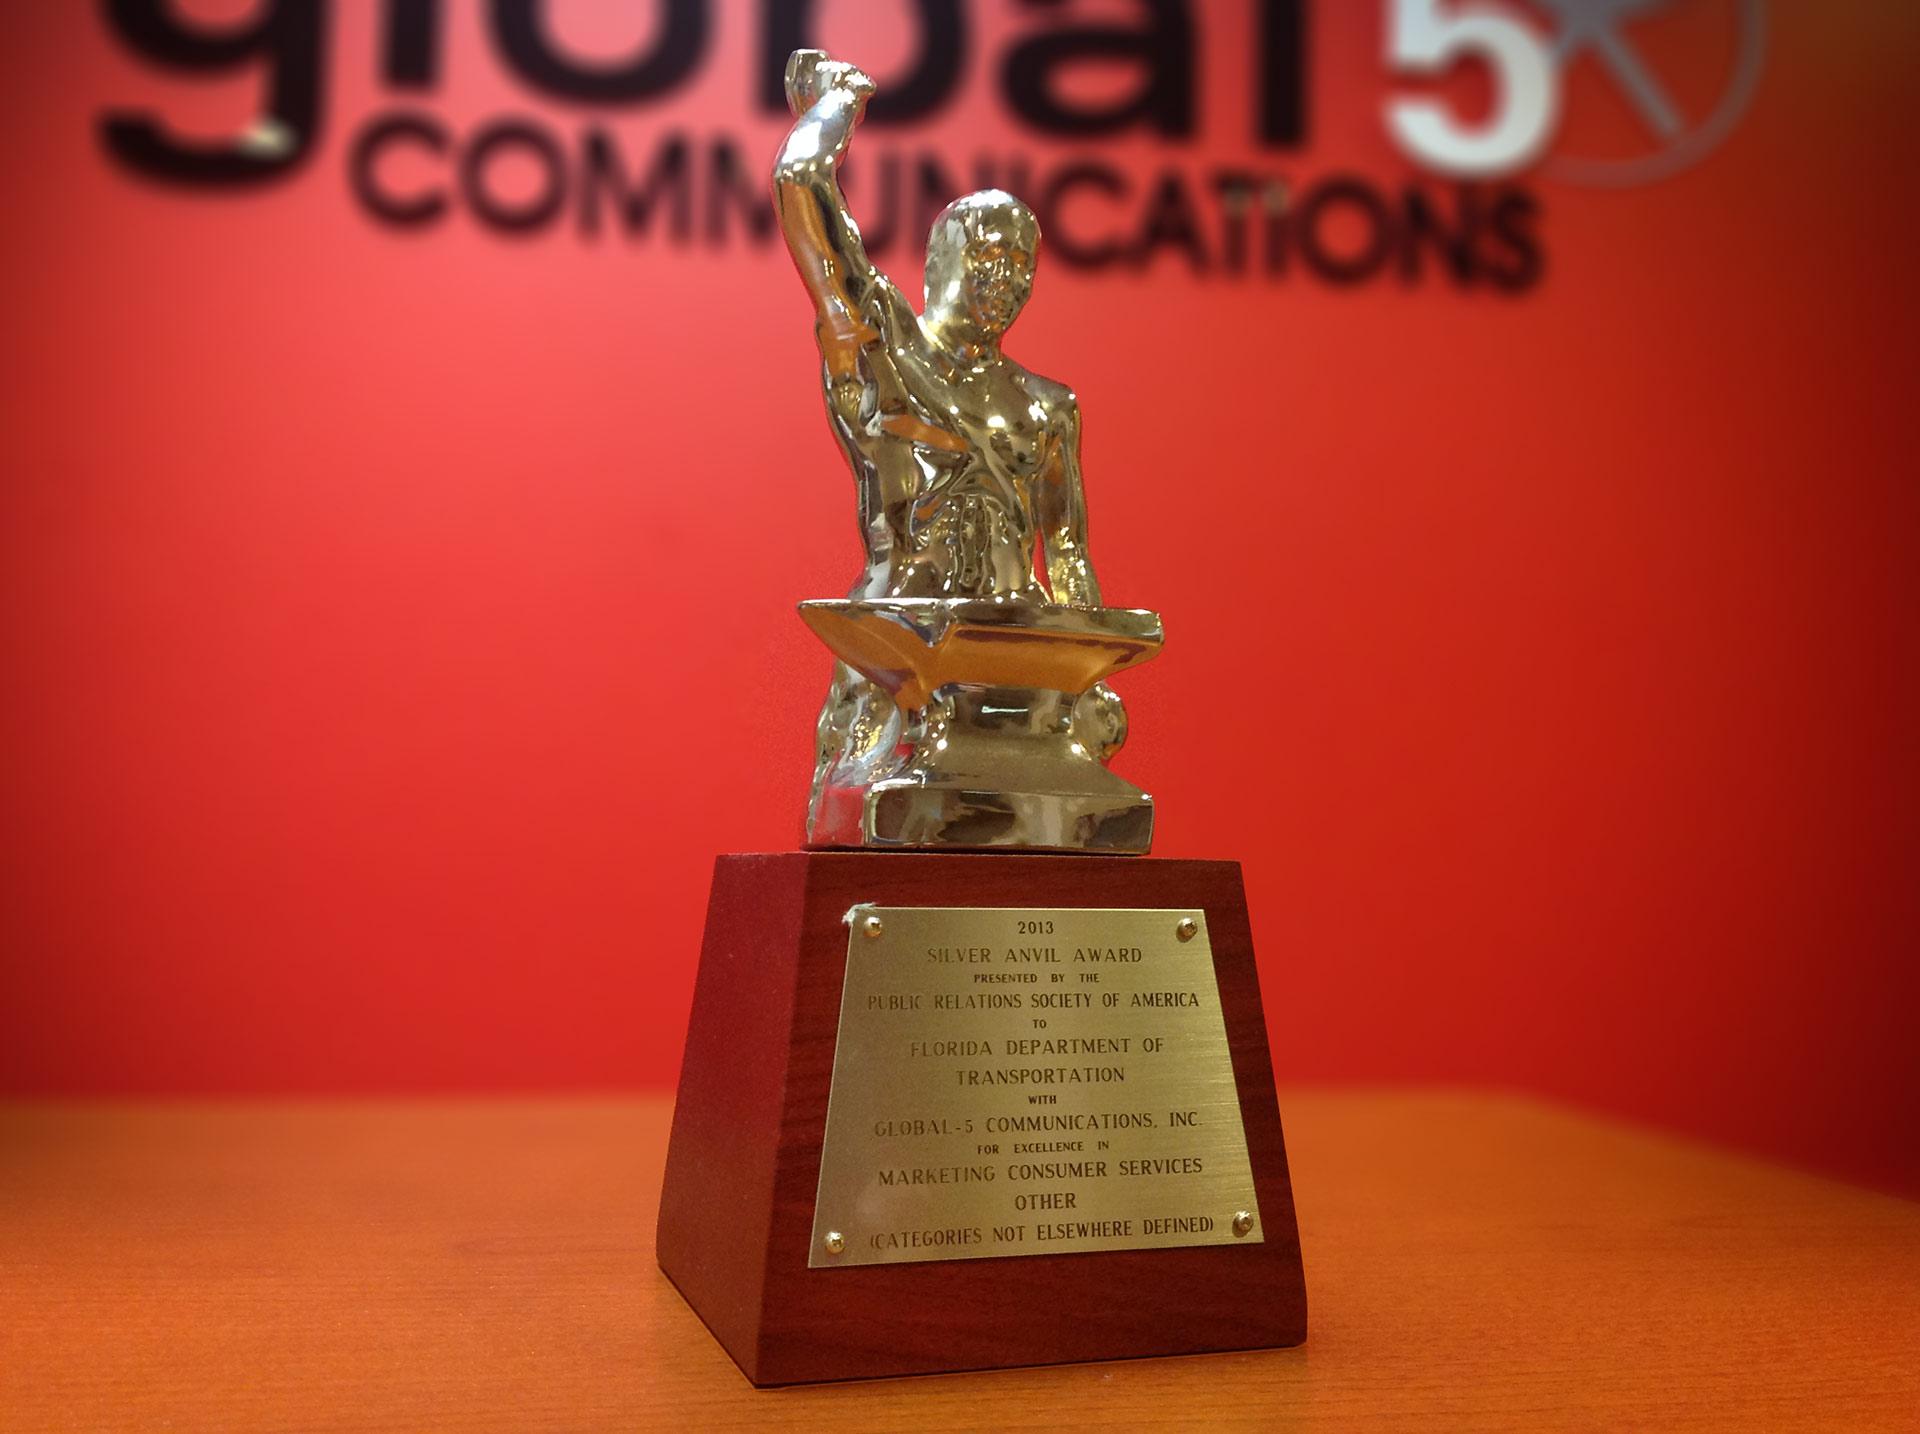 Global-5 Communications Wins 2013 PRSA Silver Anvil Award — Industry's Highest Honor